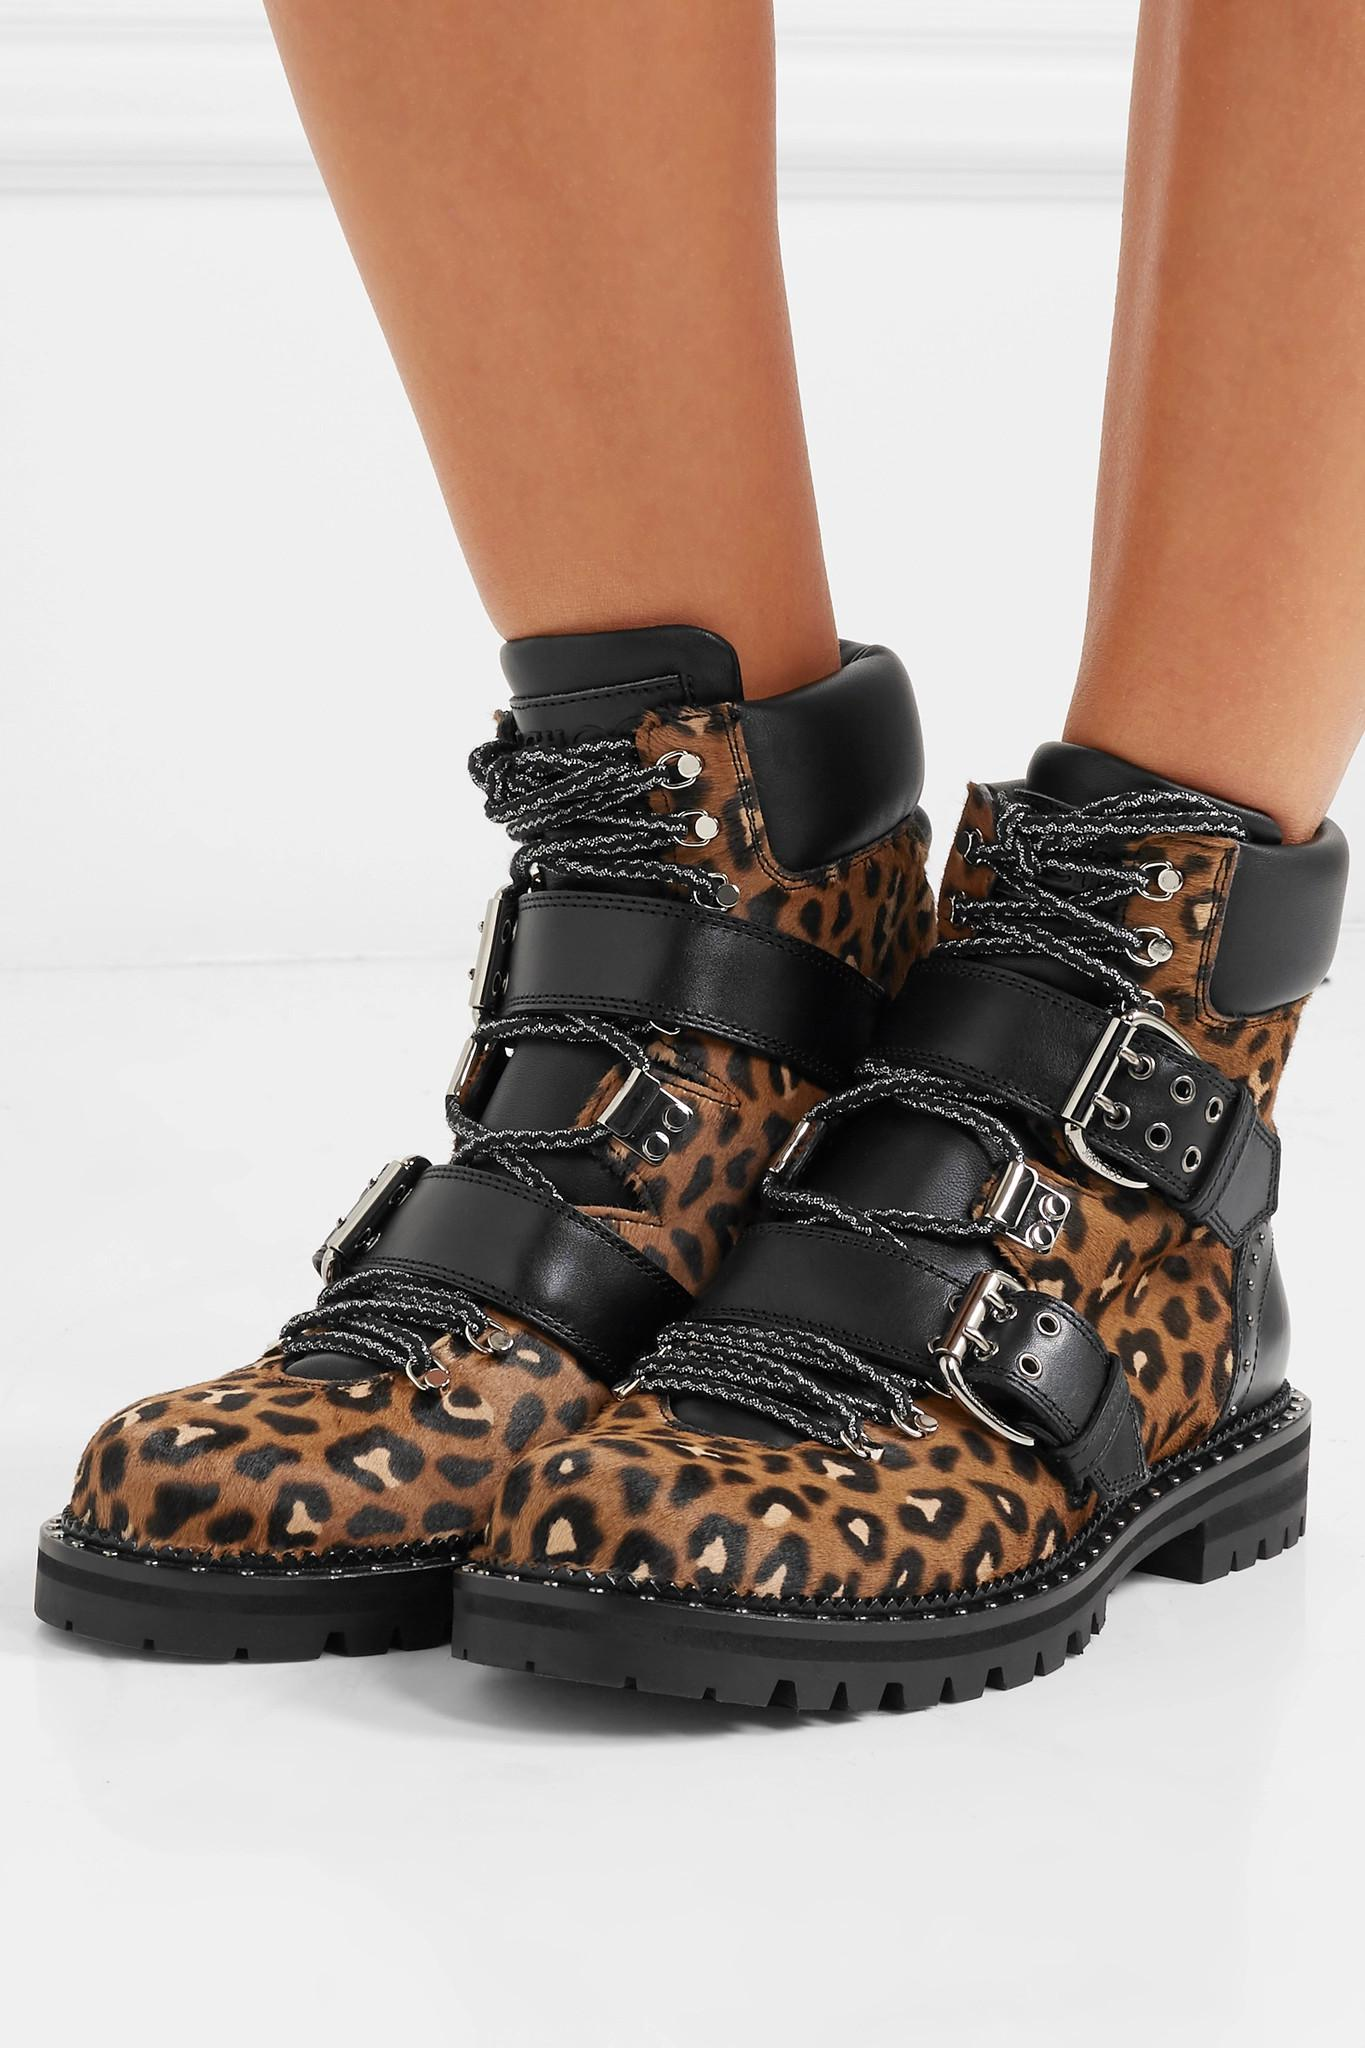 68cb6618b68e Lyst - Jimmy Choo Breeze Studded Leather-trimmed Leopard-print Calf ...